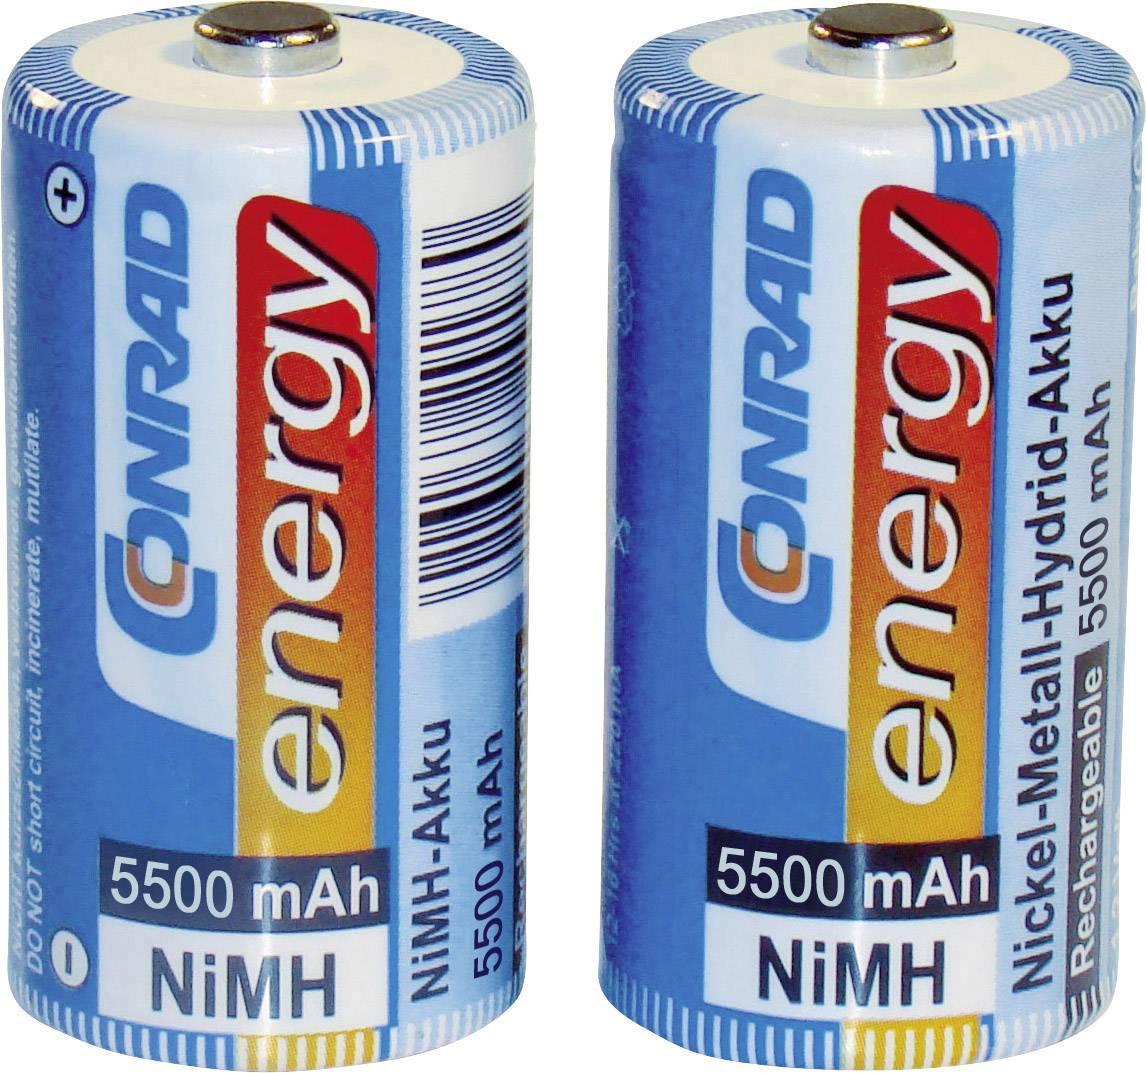 Akumulátor typu C NiMH Conrad energy HR14 1371332, 5500 mAh, 1.2 V, 2 ks